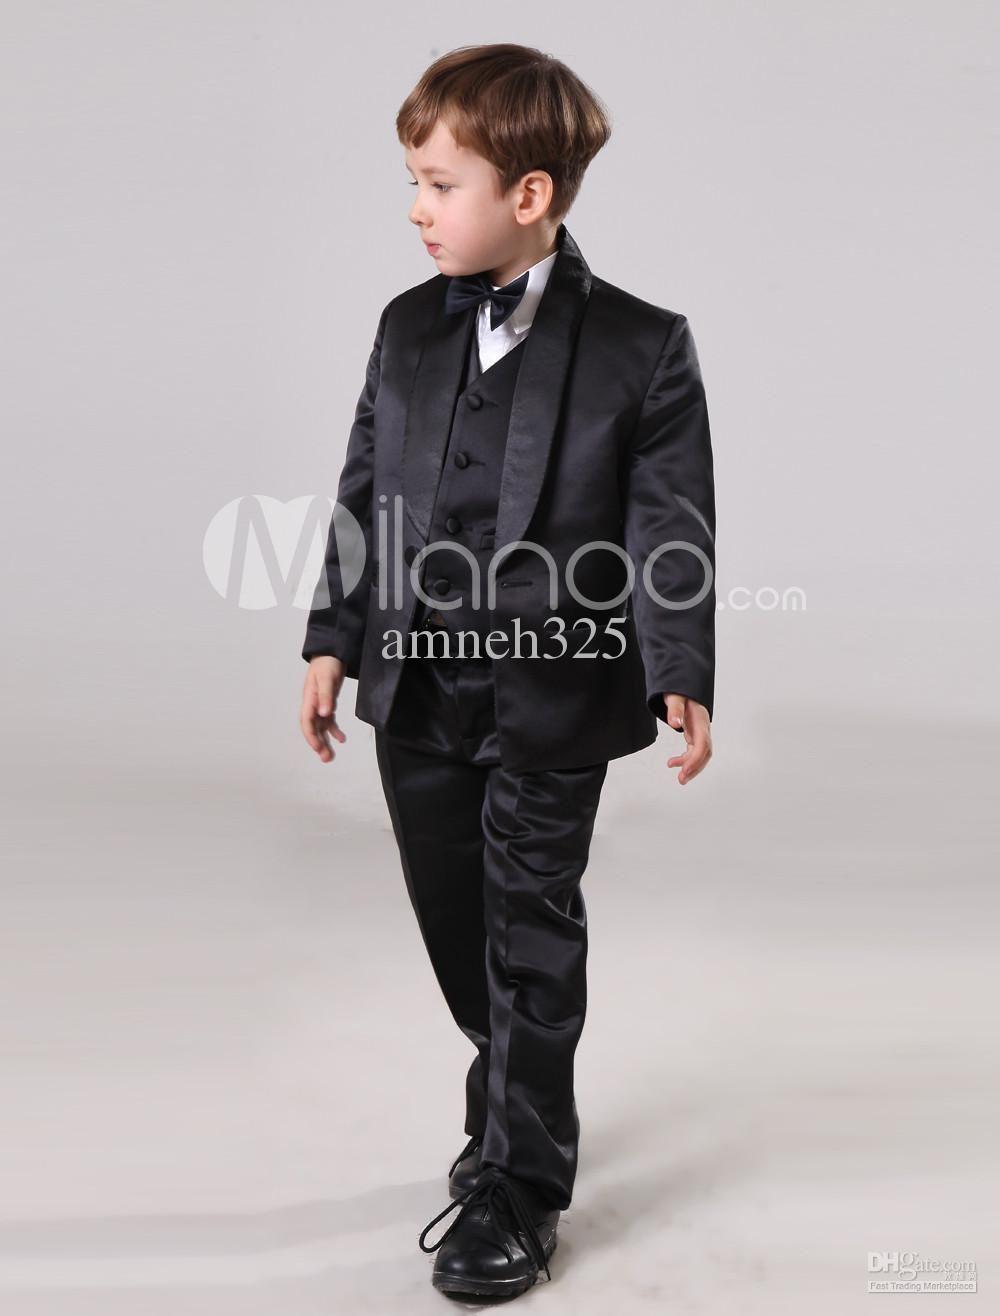 2017 fashion black boys ring bearer suits jacket